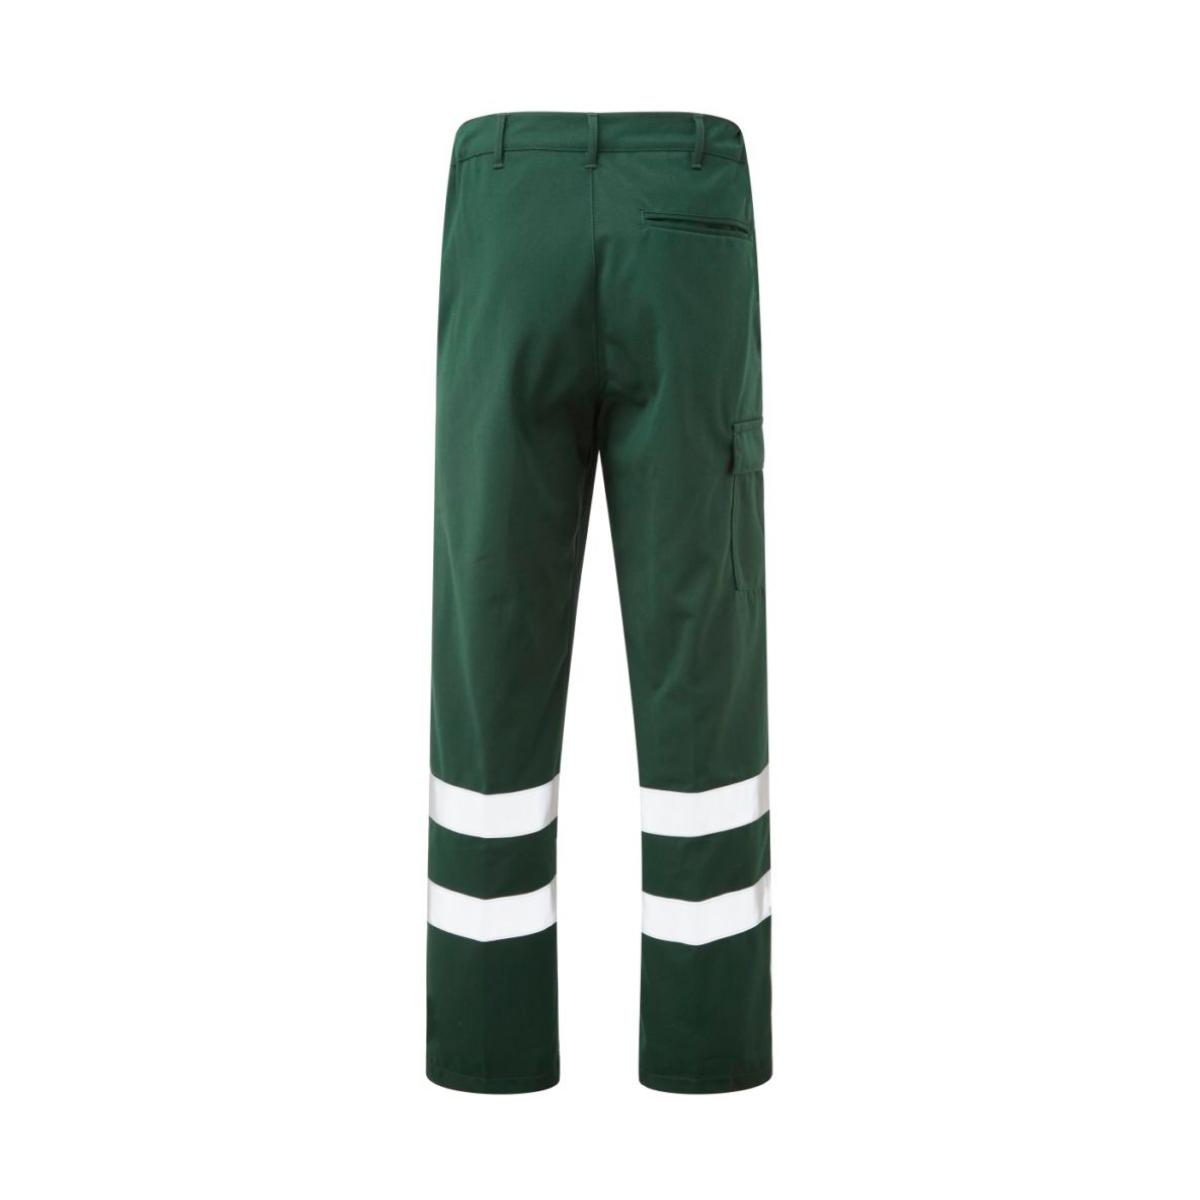 AS2305_HAZTEC® Tengiz FR AS Inherent Green Combat Trousers_Back